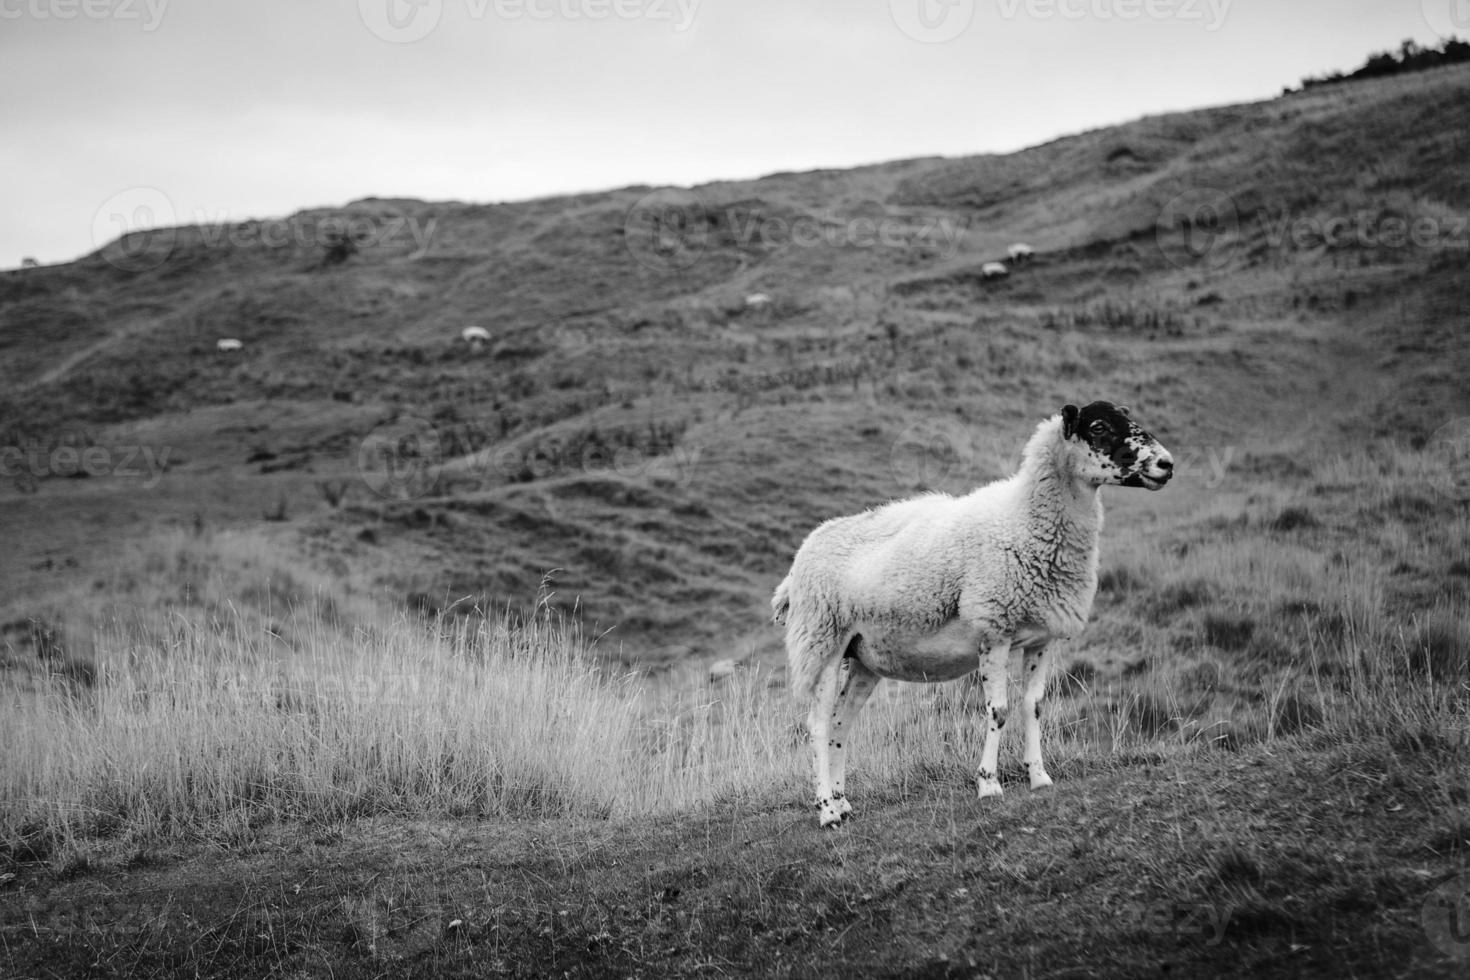 Sheep grazing on a hillside photo